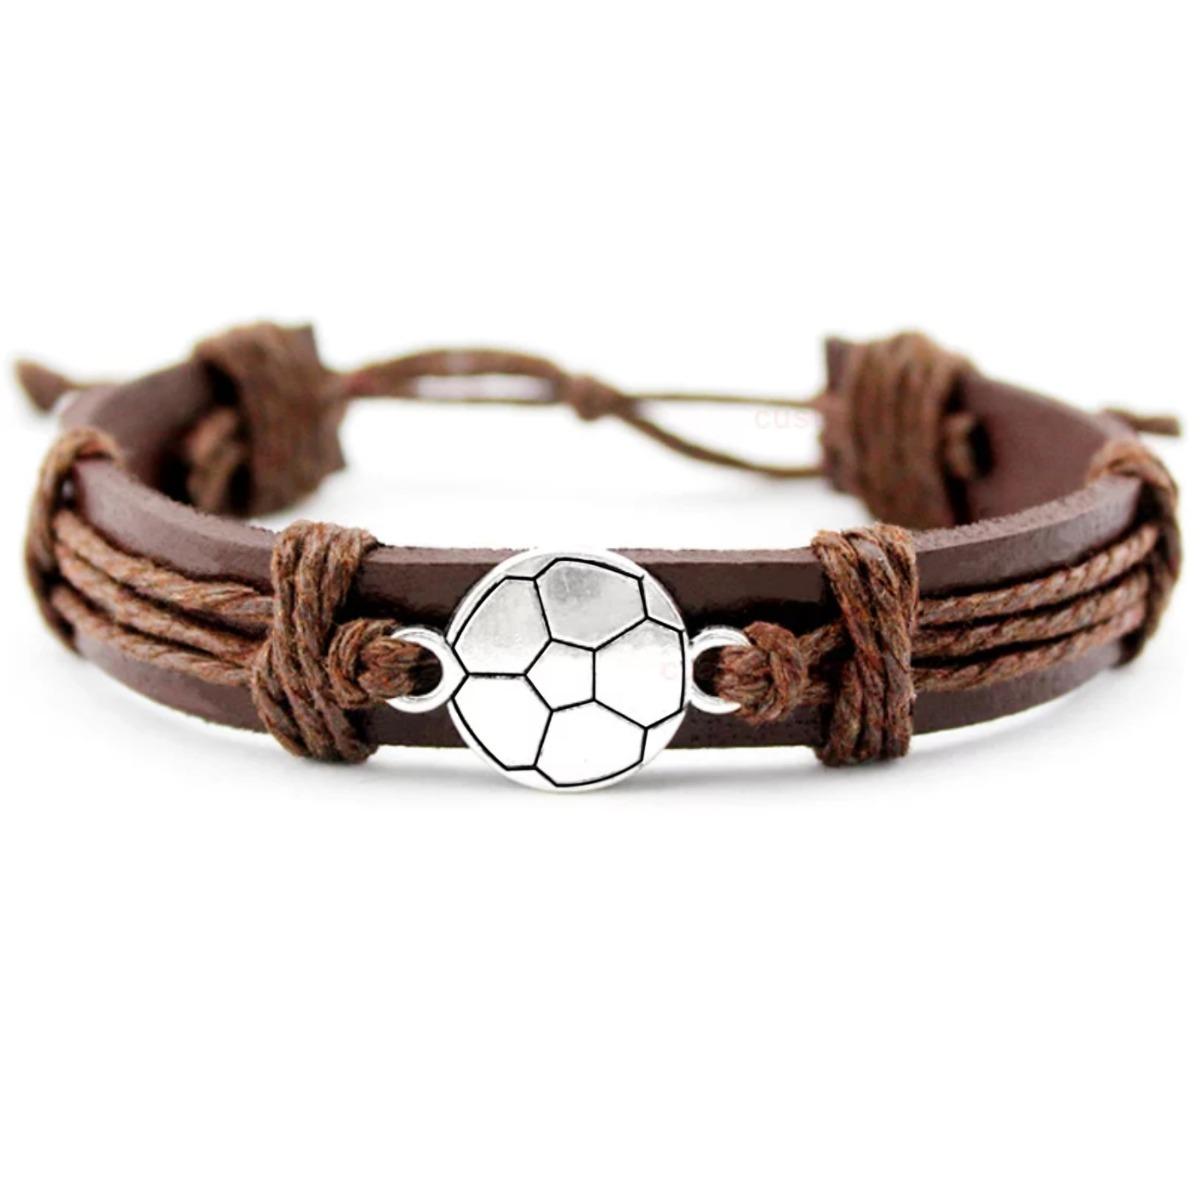 06c93f88062f Pulsera De Moda Para Caballero Dije Fútbol Soccer -   179.00 en ...